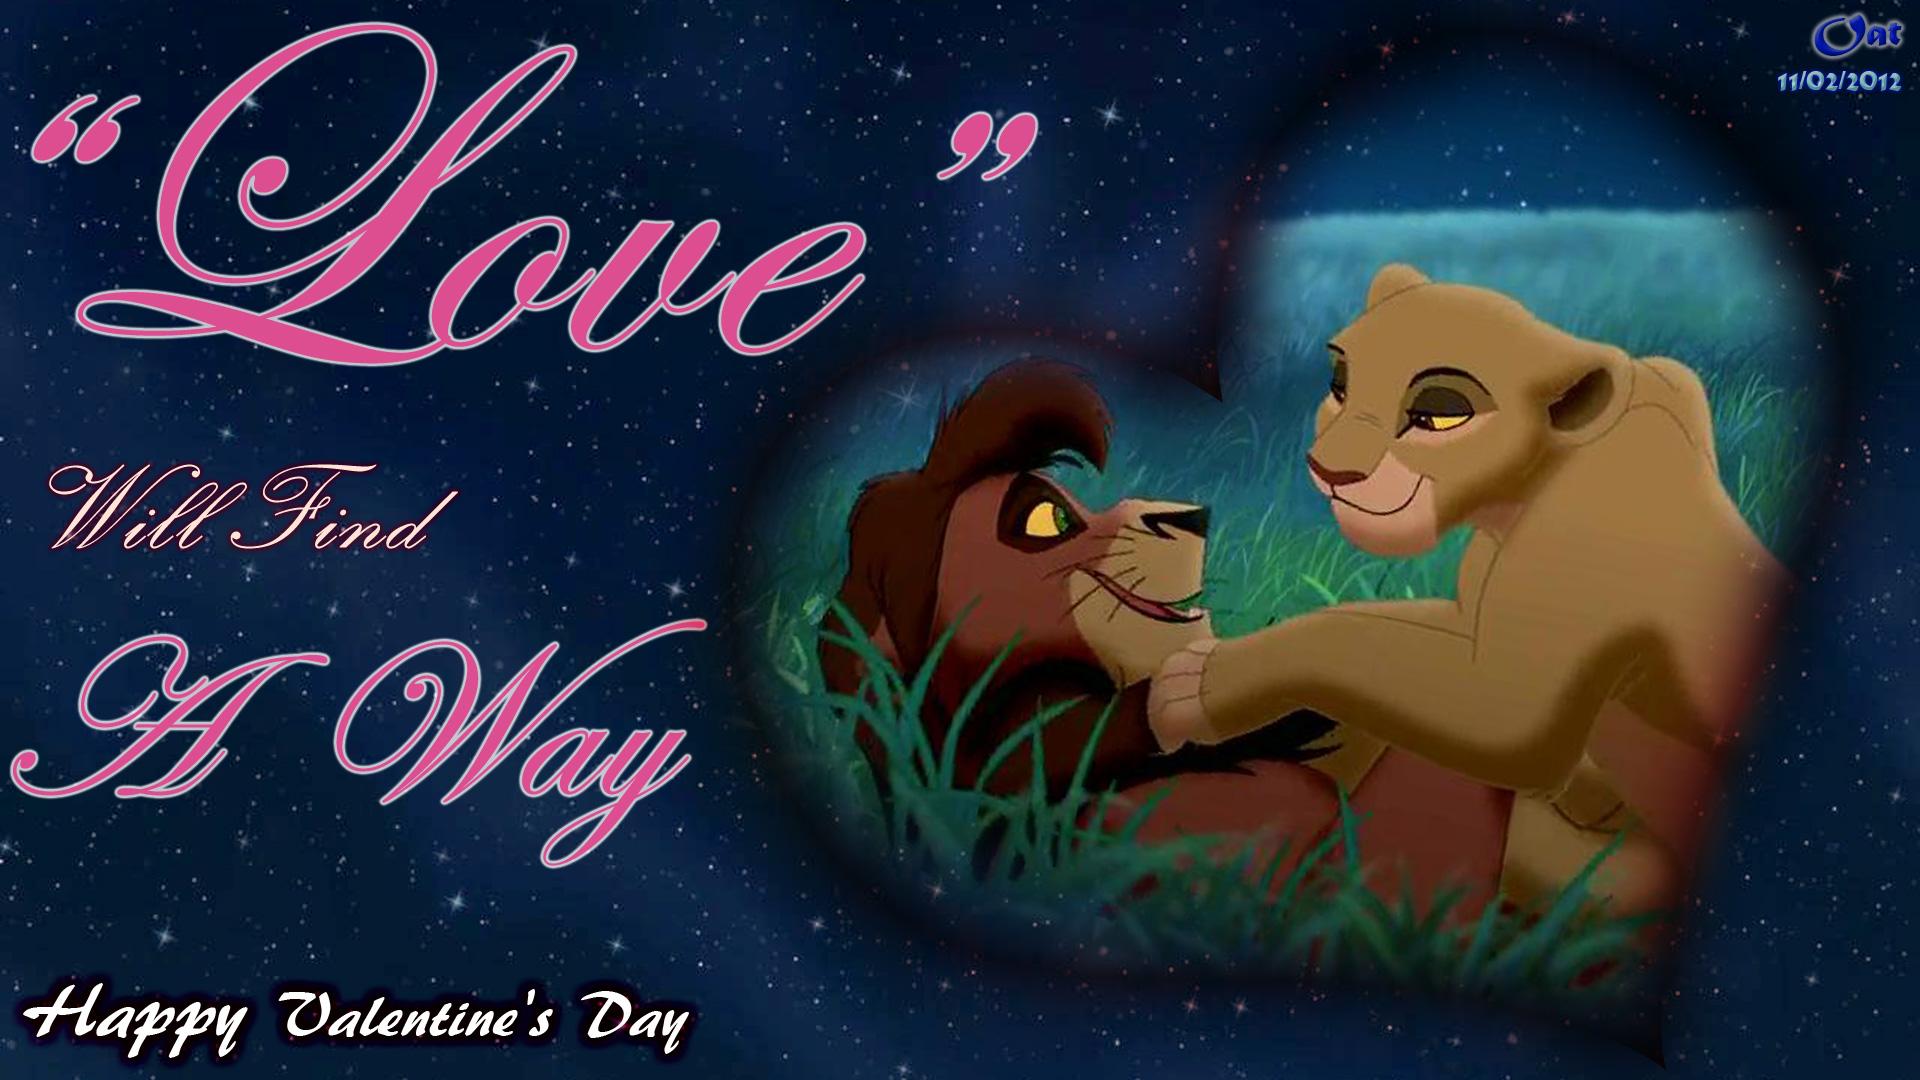 Kovu & Kiara Amor Wallpaper - Lion King Kovu And Kiara Love - HD Wallpaper